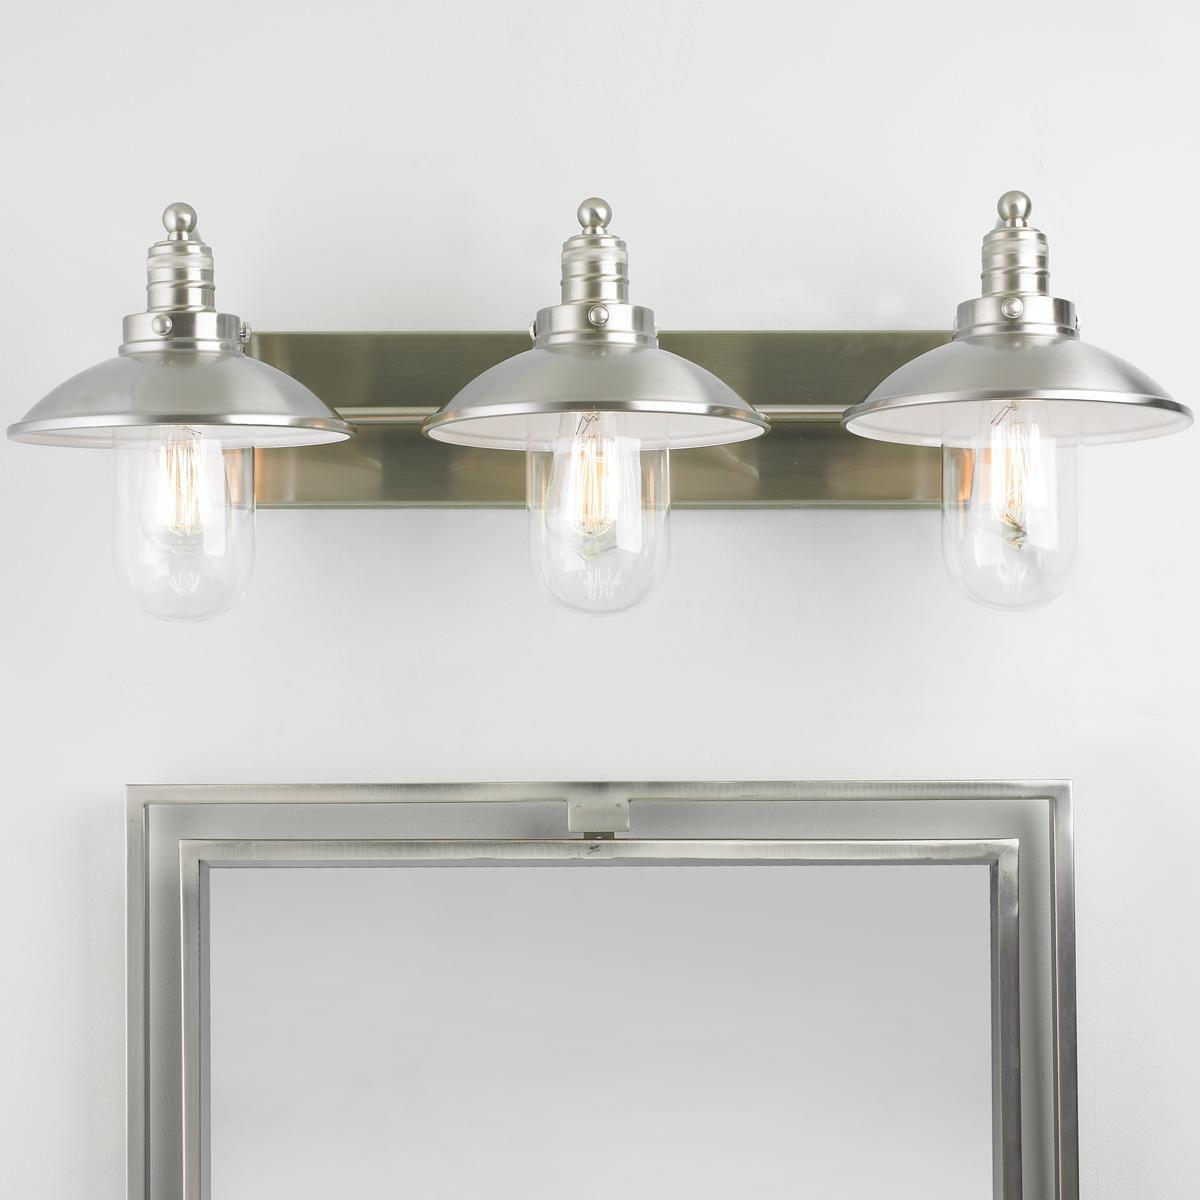 Nautical bathroom light fixtures - Schooner 3 Light Bath Light This 3 Light Vanity Light Will Complement Nautical